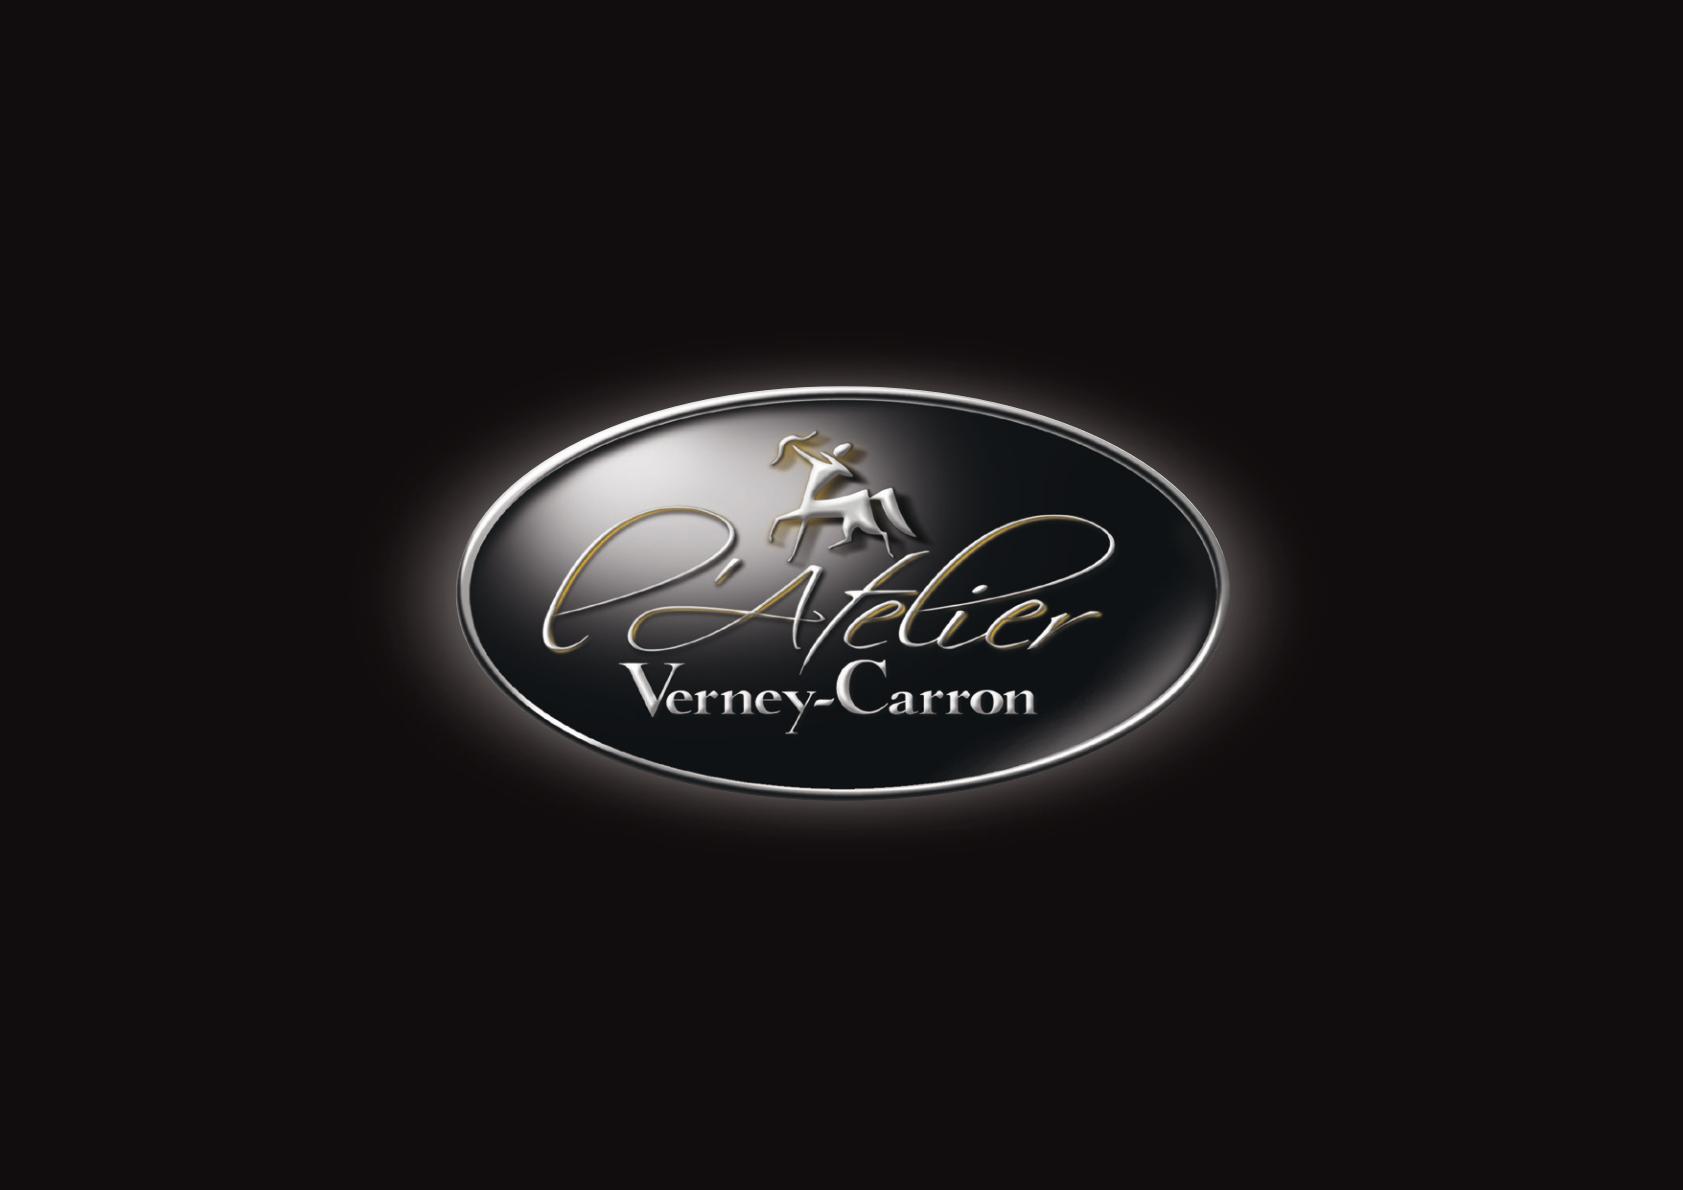 L'Atelier-Verney-Carron.jpg